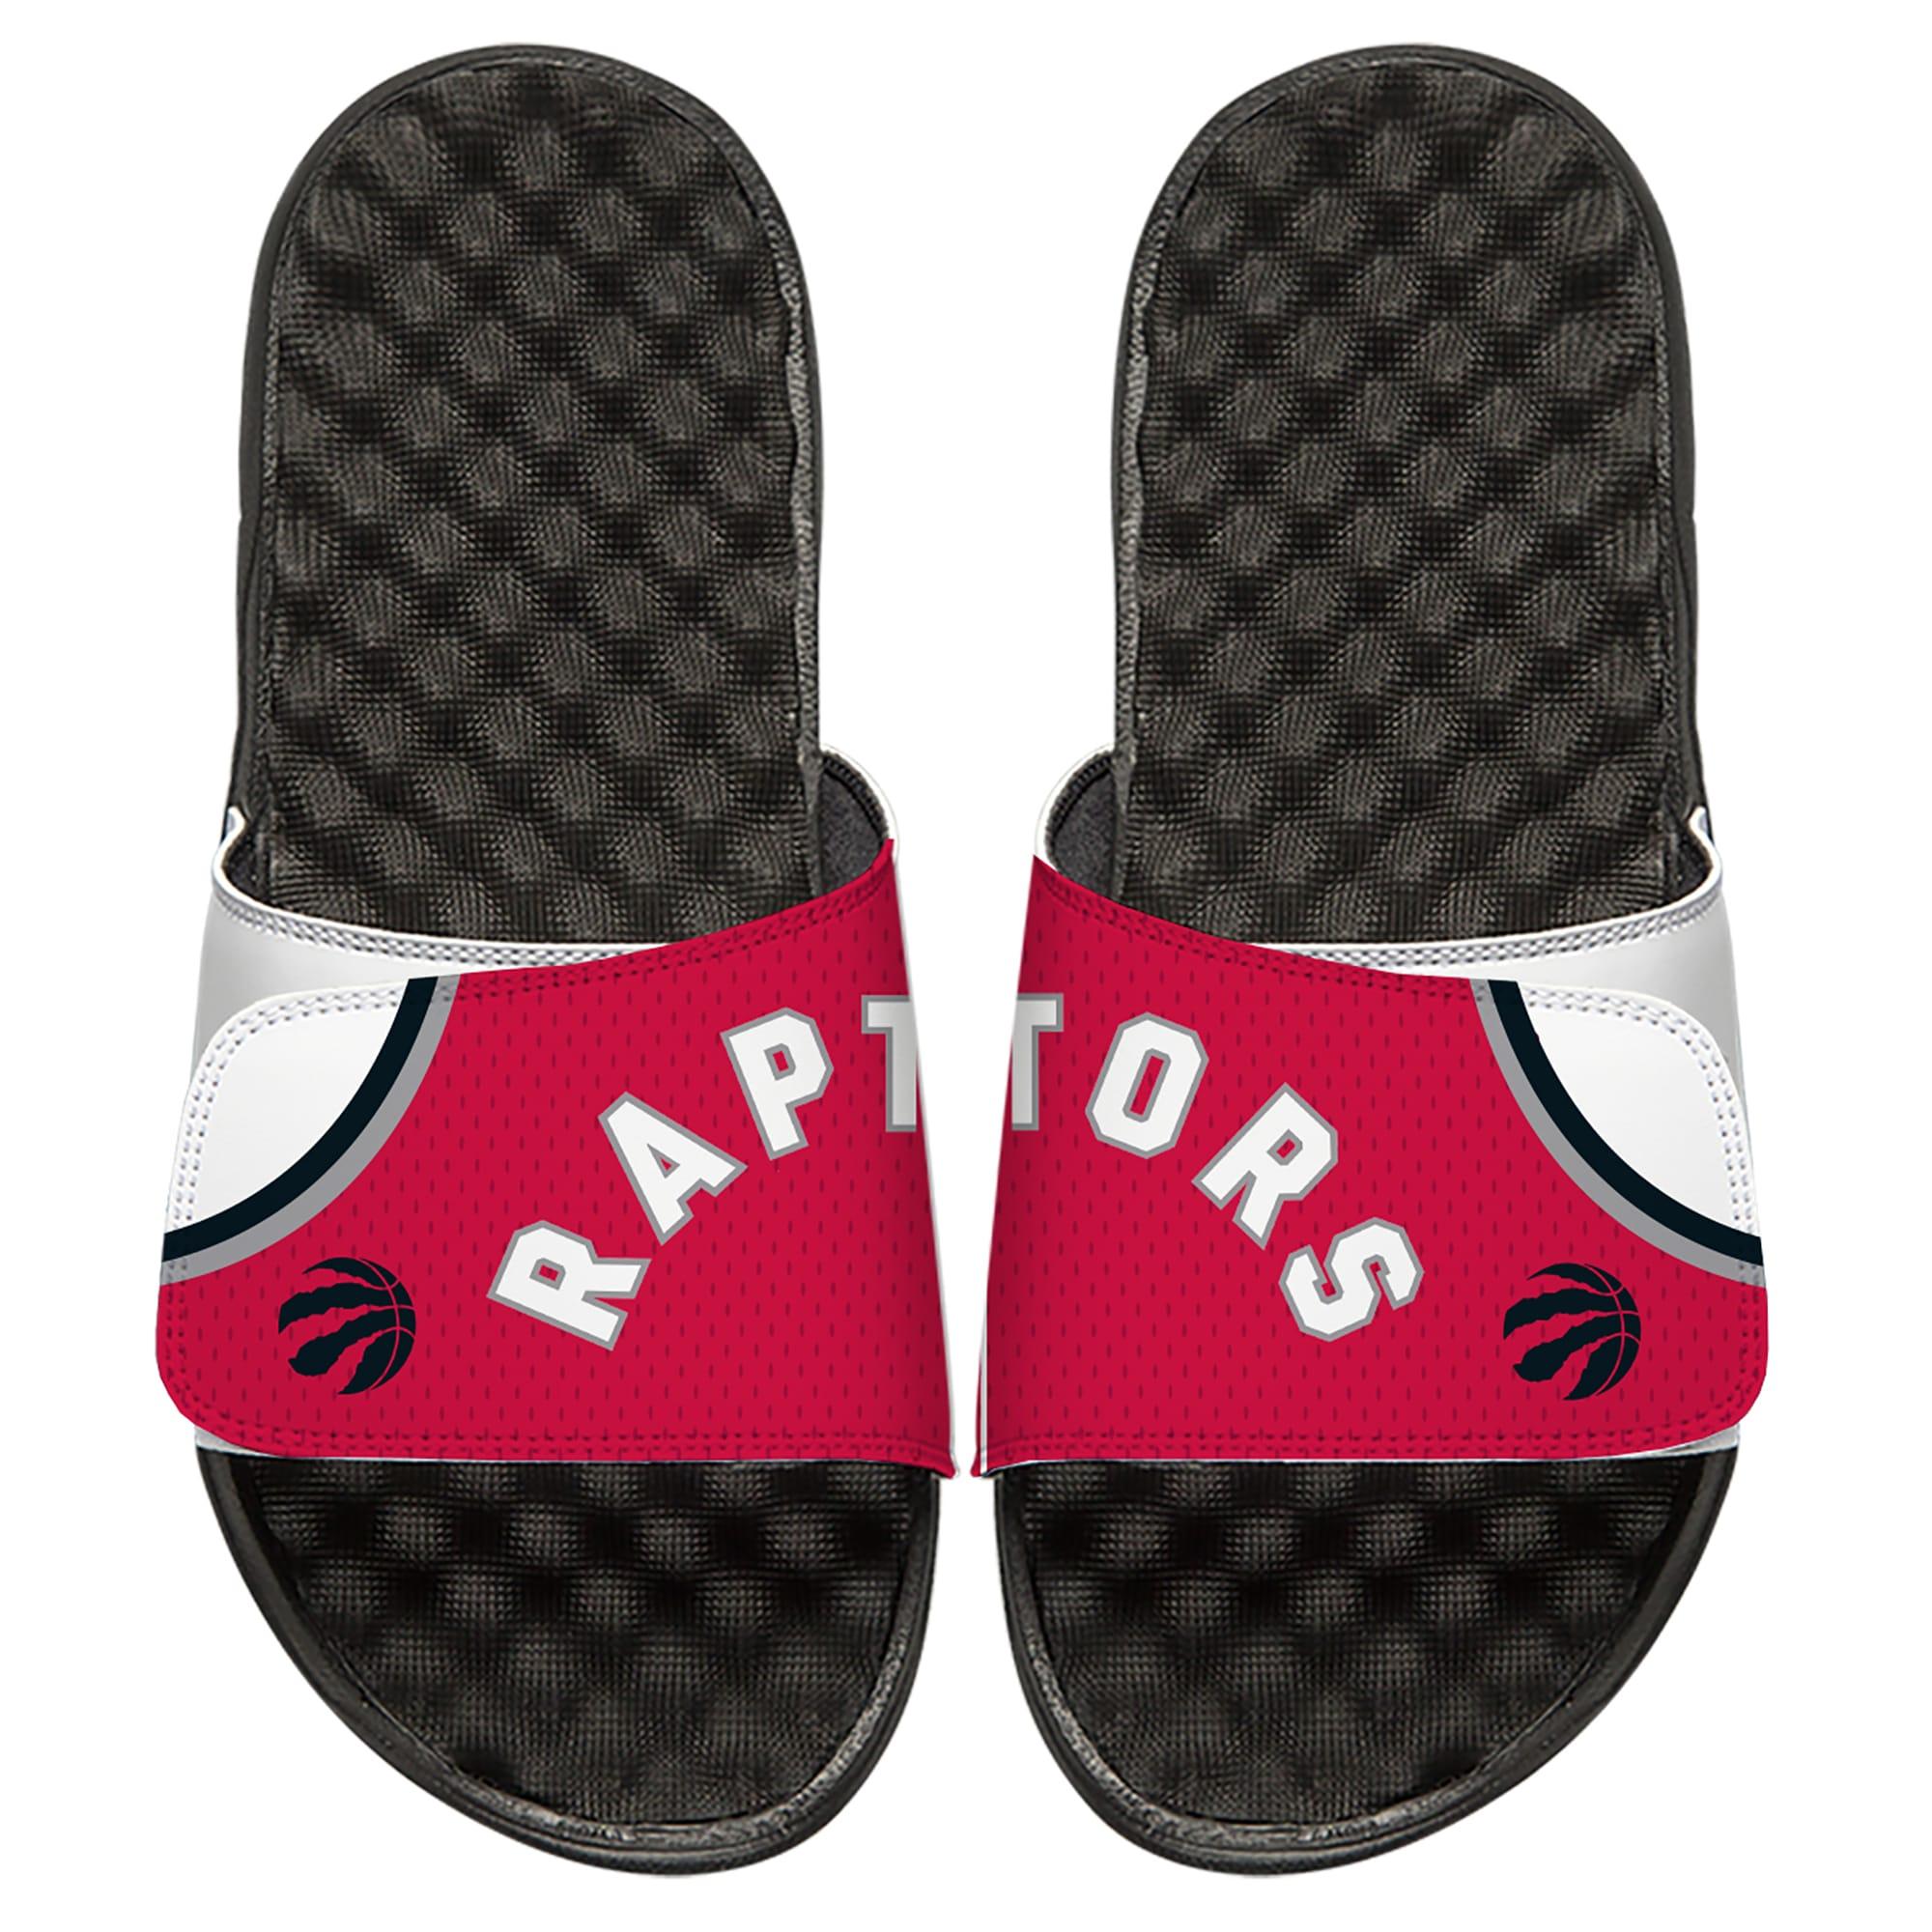 Toronto Raptors ISlide Away Jersey Split Slide Sandals - White